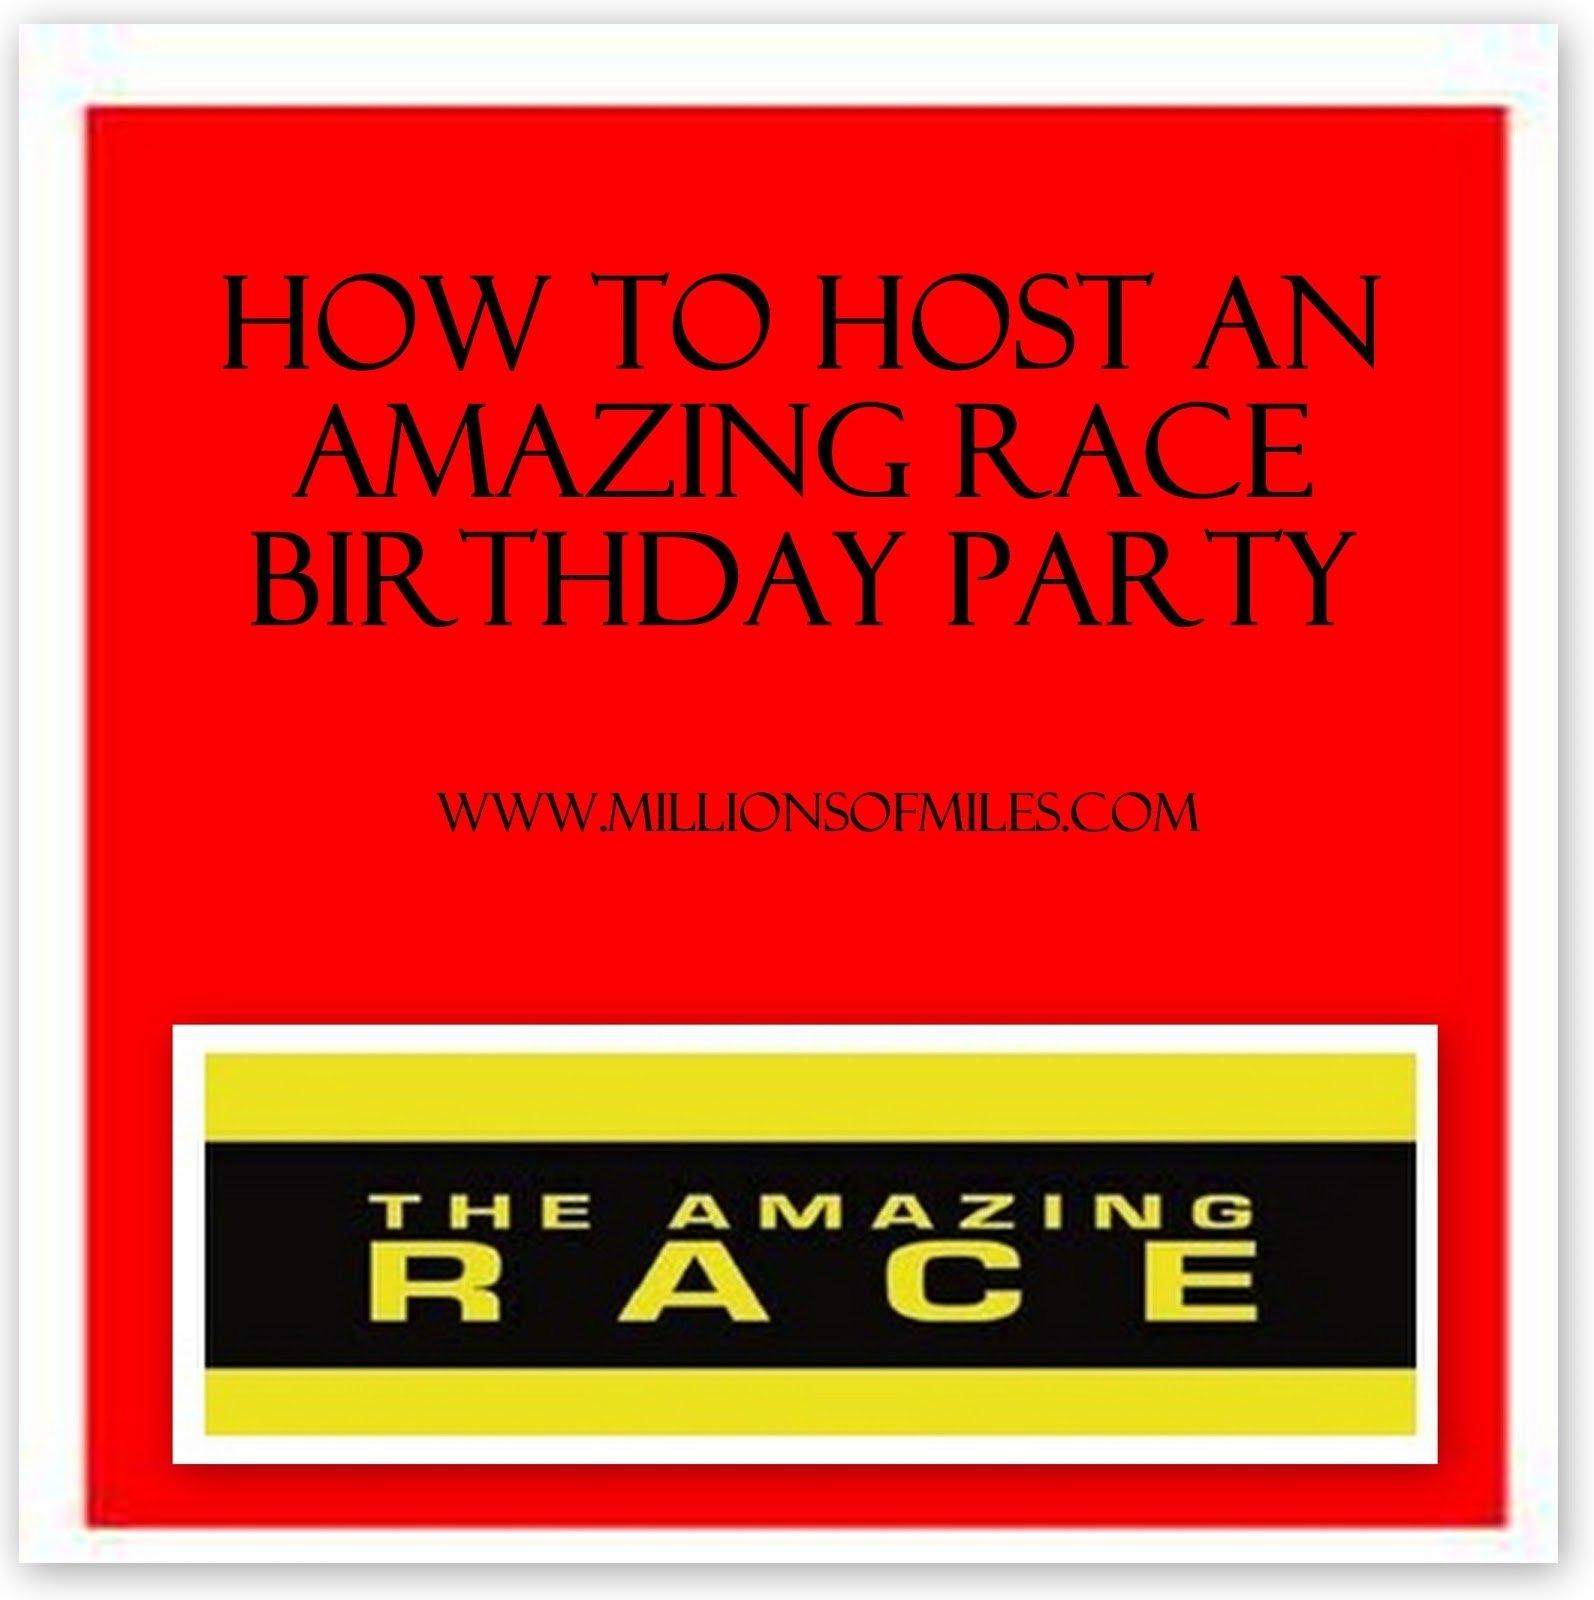 10 Wonderful Amazing Race Birthday Party Ideas millions of miles our amazing race birthday party 1 2020